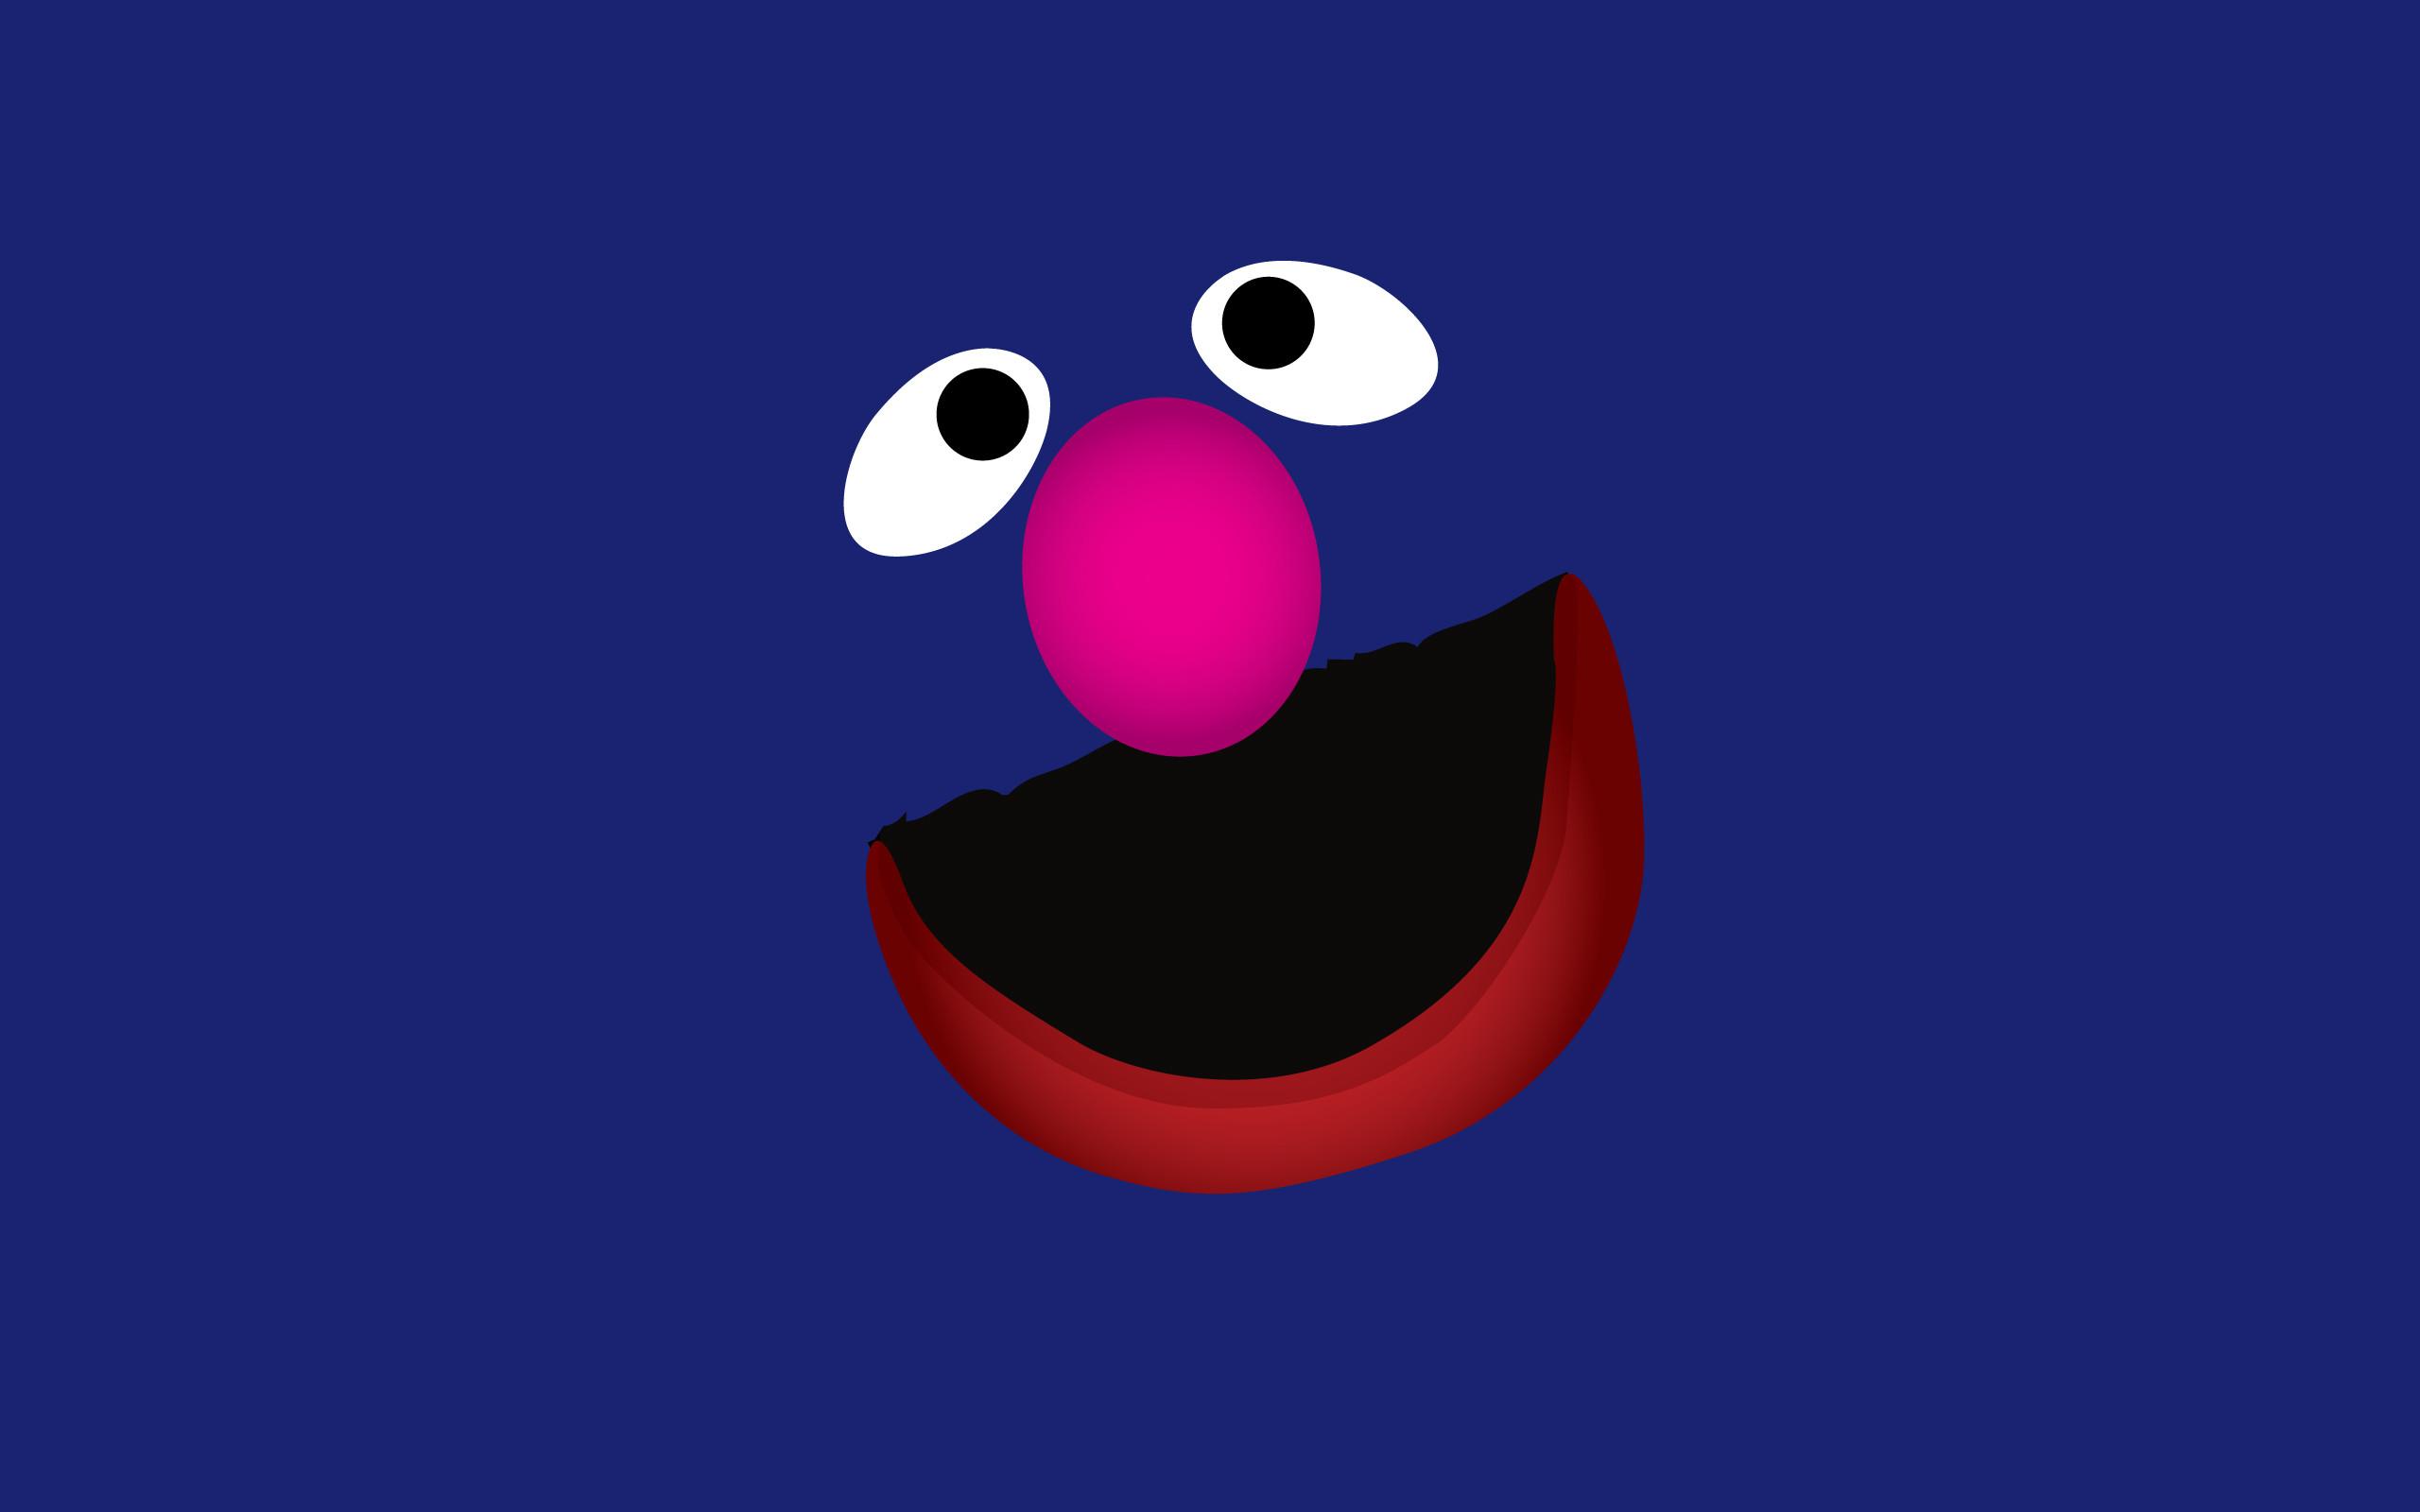 Sesame Street   Resolution: px, Fredericka Bouknight